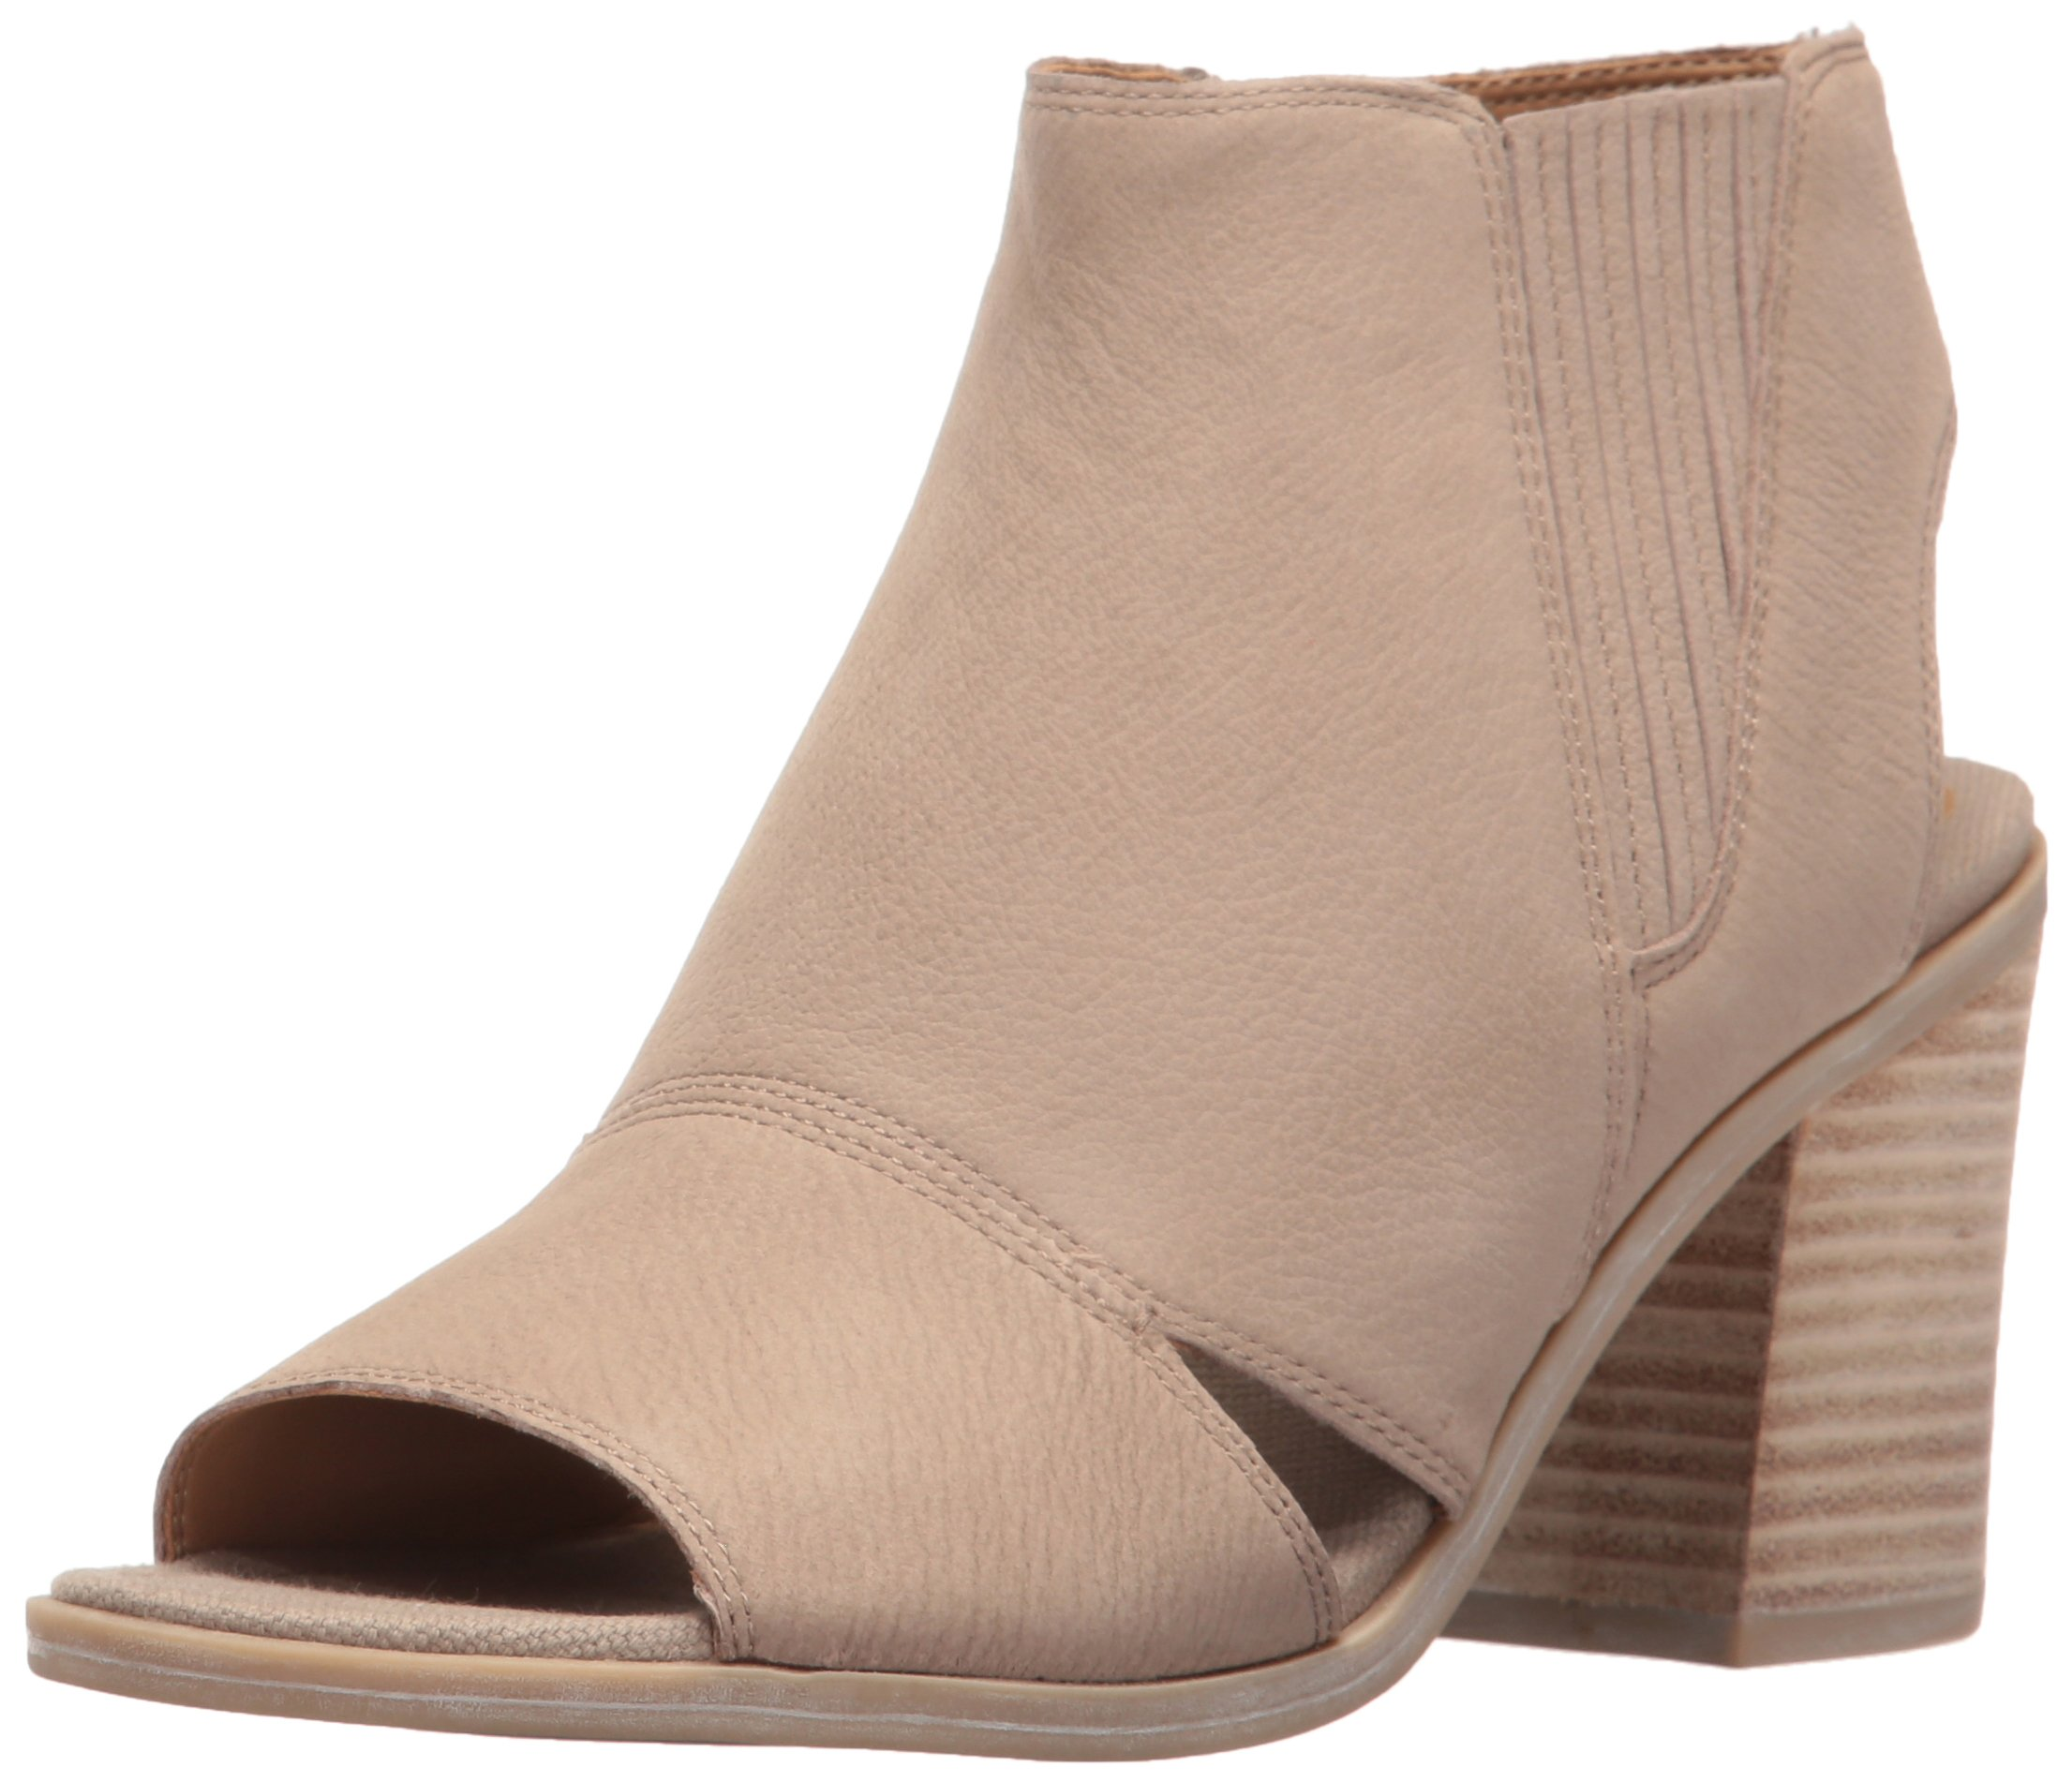 Franco Sarto Women's Galaxy Heeled Sandal, Hi Tech Grey, 8 Medium US